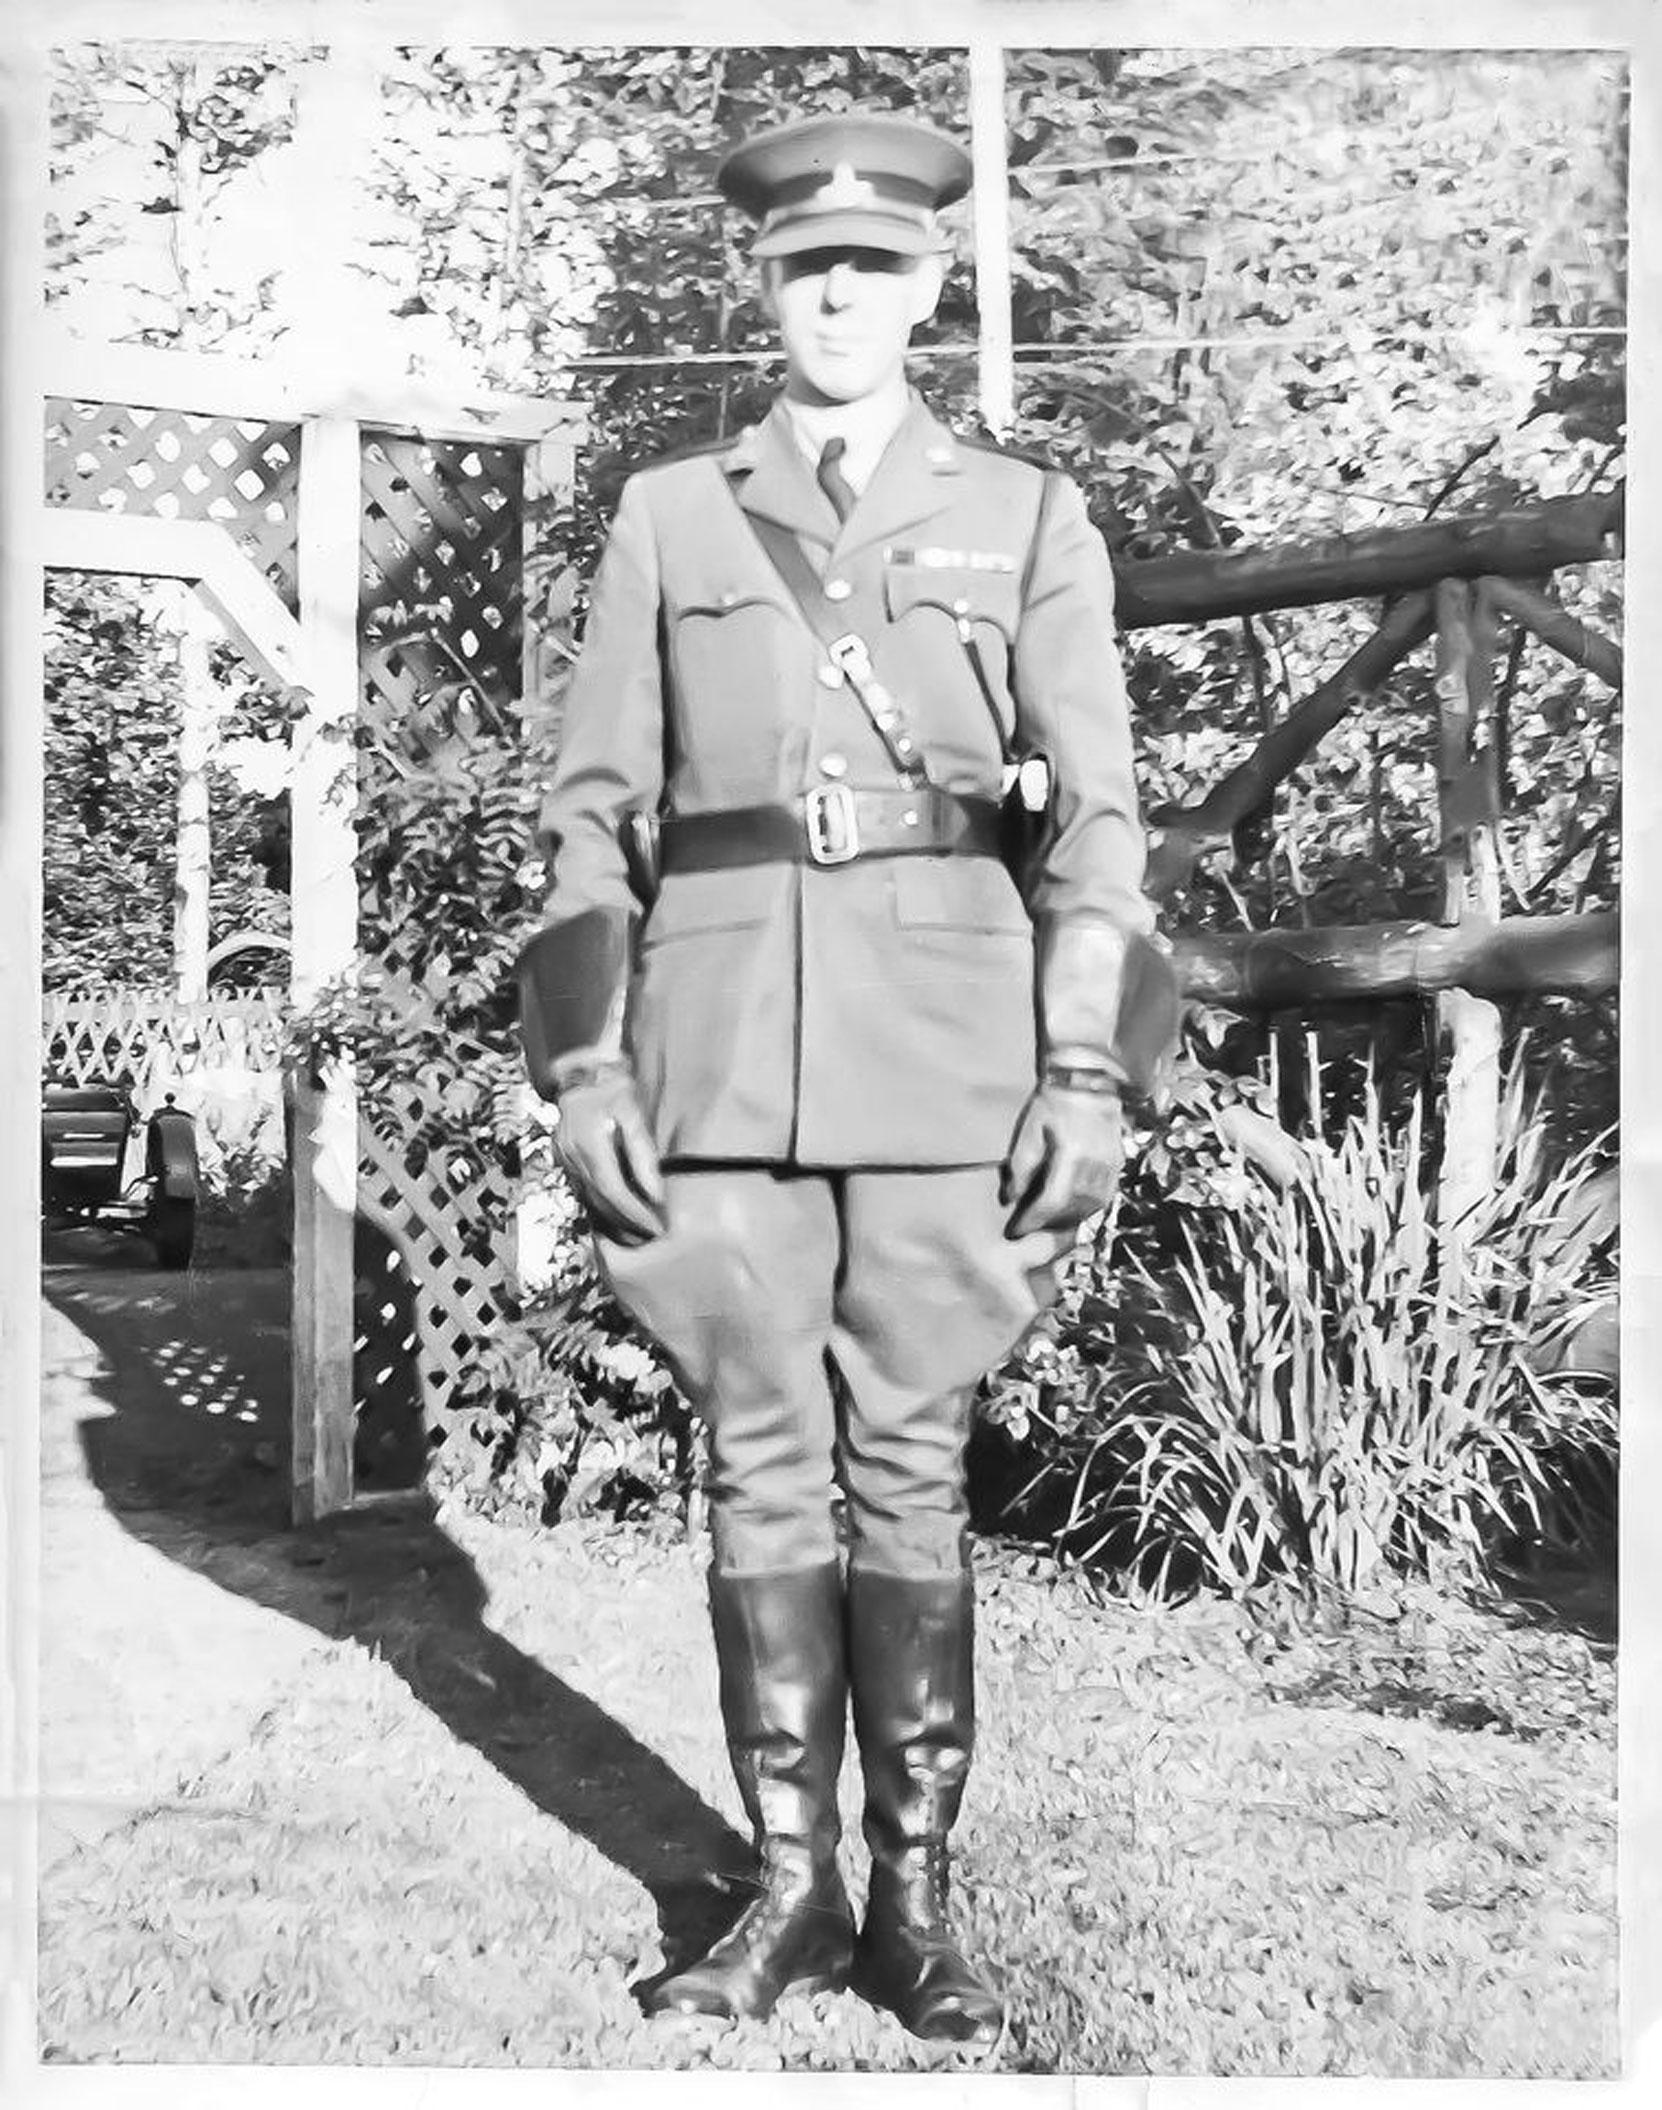 William Percy Aylward in B.C. Provincial Police uniform, Victoria, circa 1922. (Photo courtesy of Rick Aylward - used with permission)